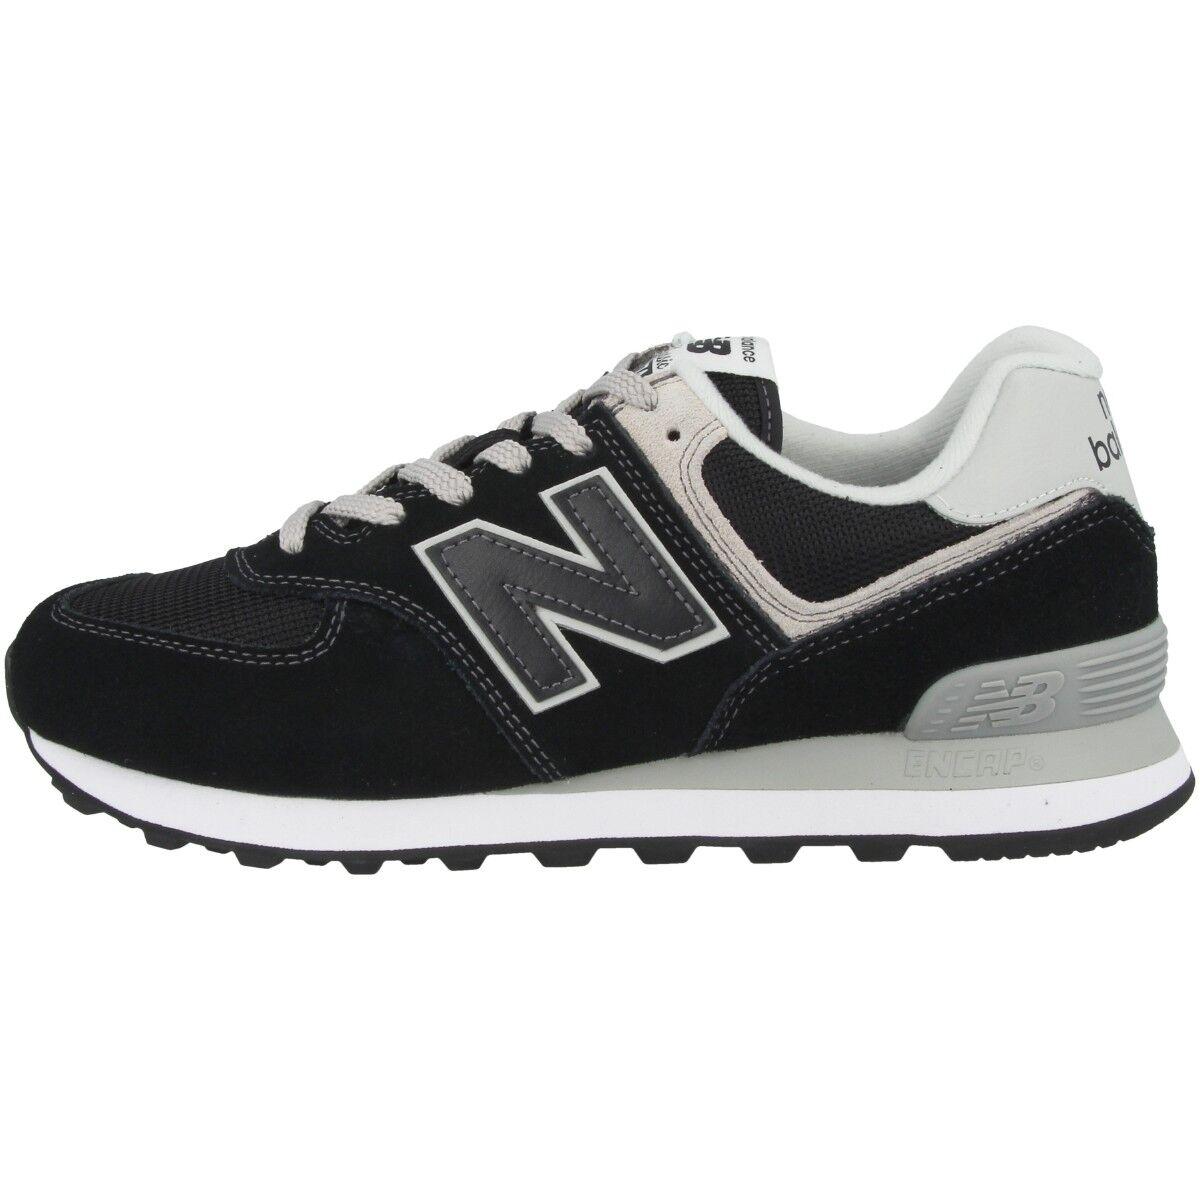 New balance WL 574 eb Women zapatos señora casual zapatillas Black White wl574eb